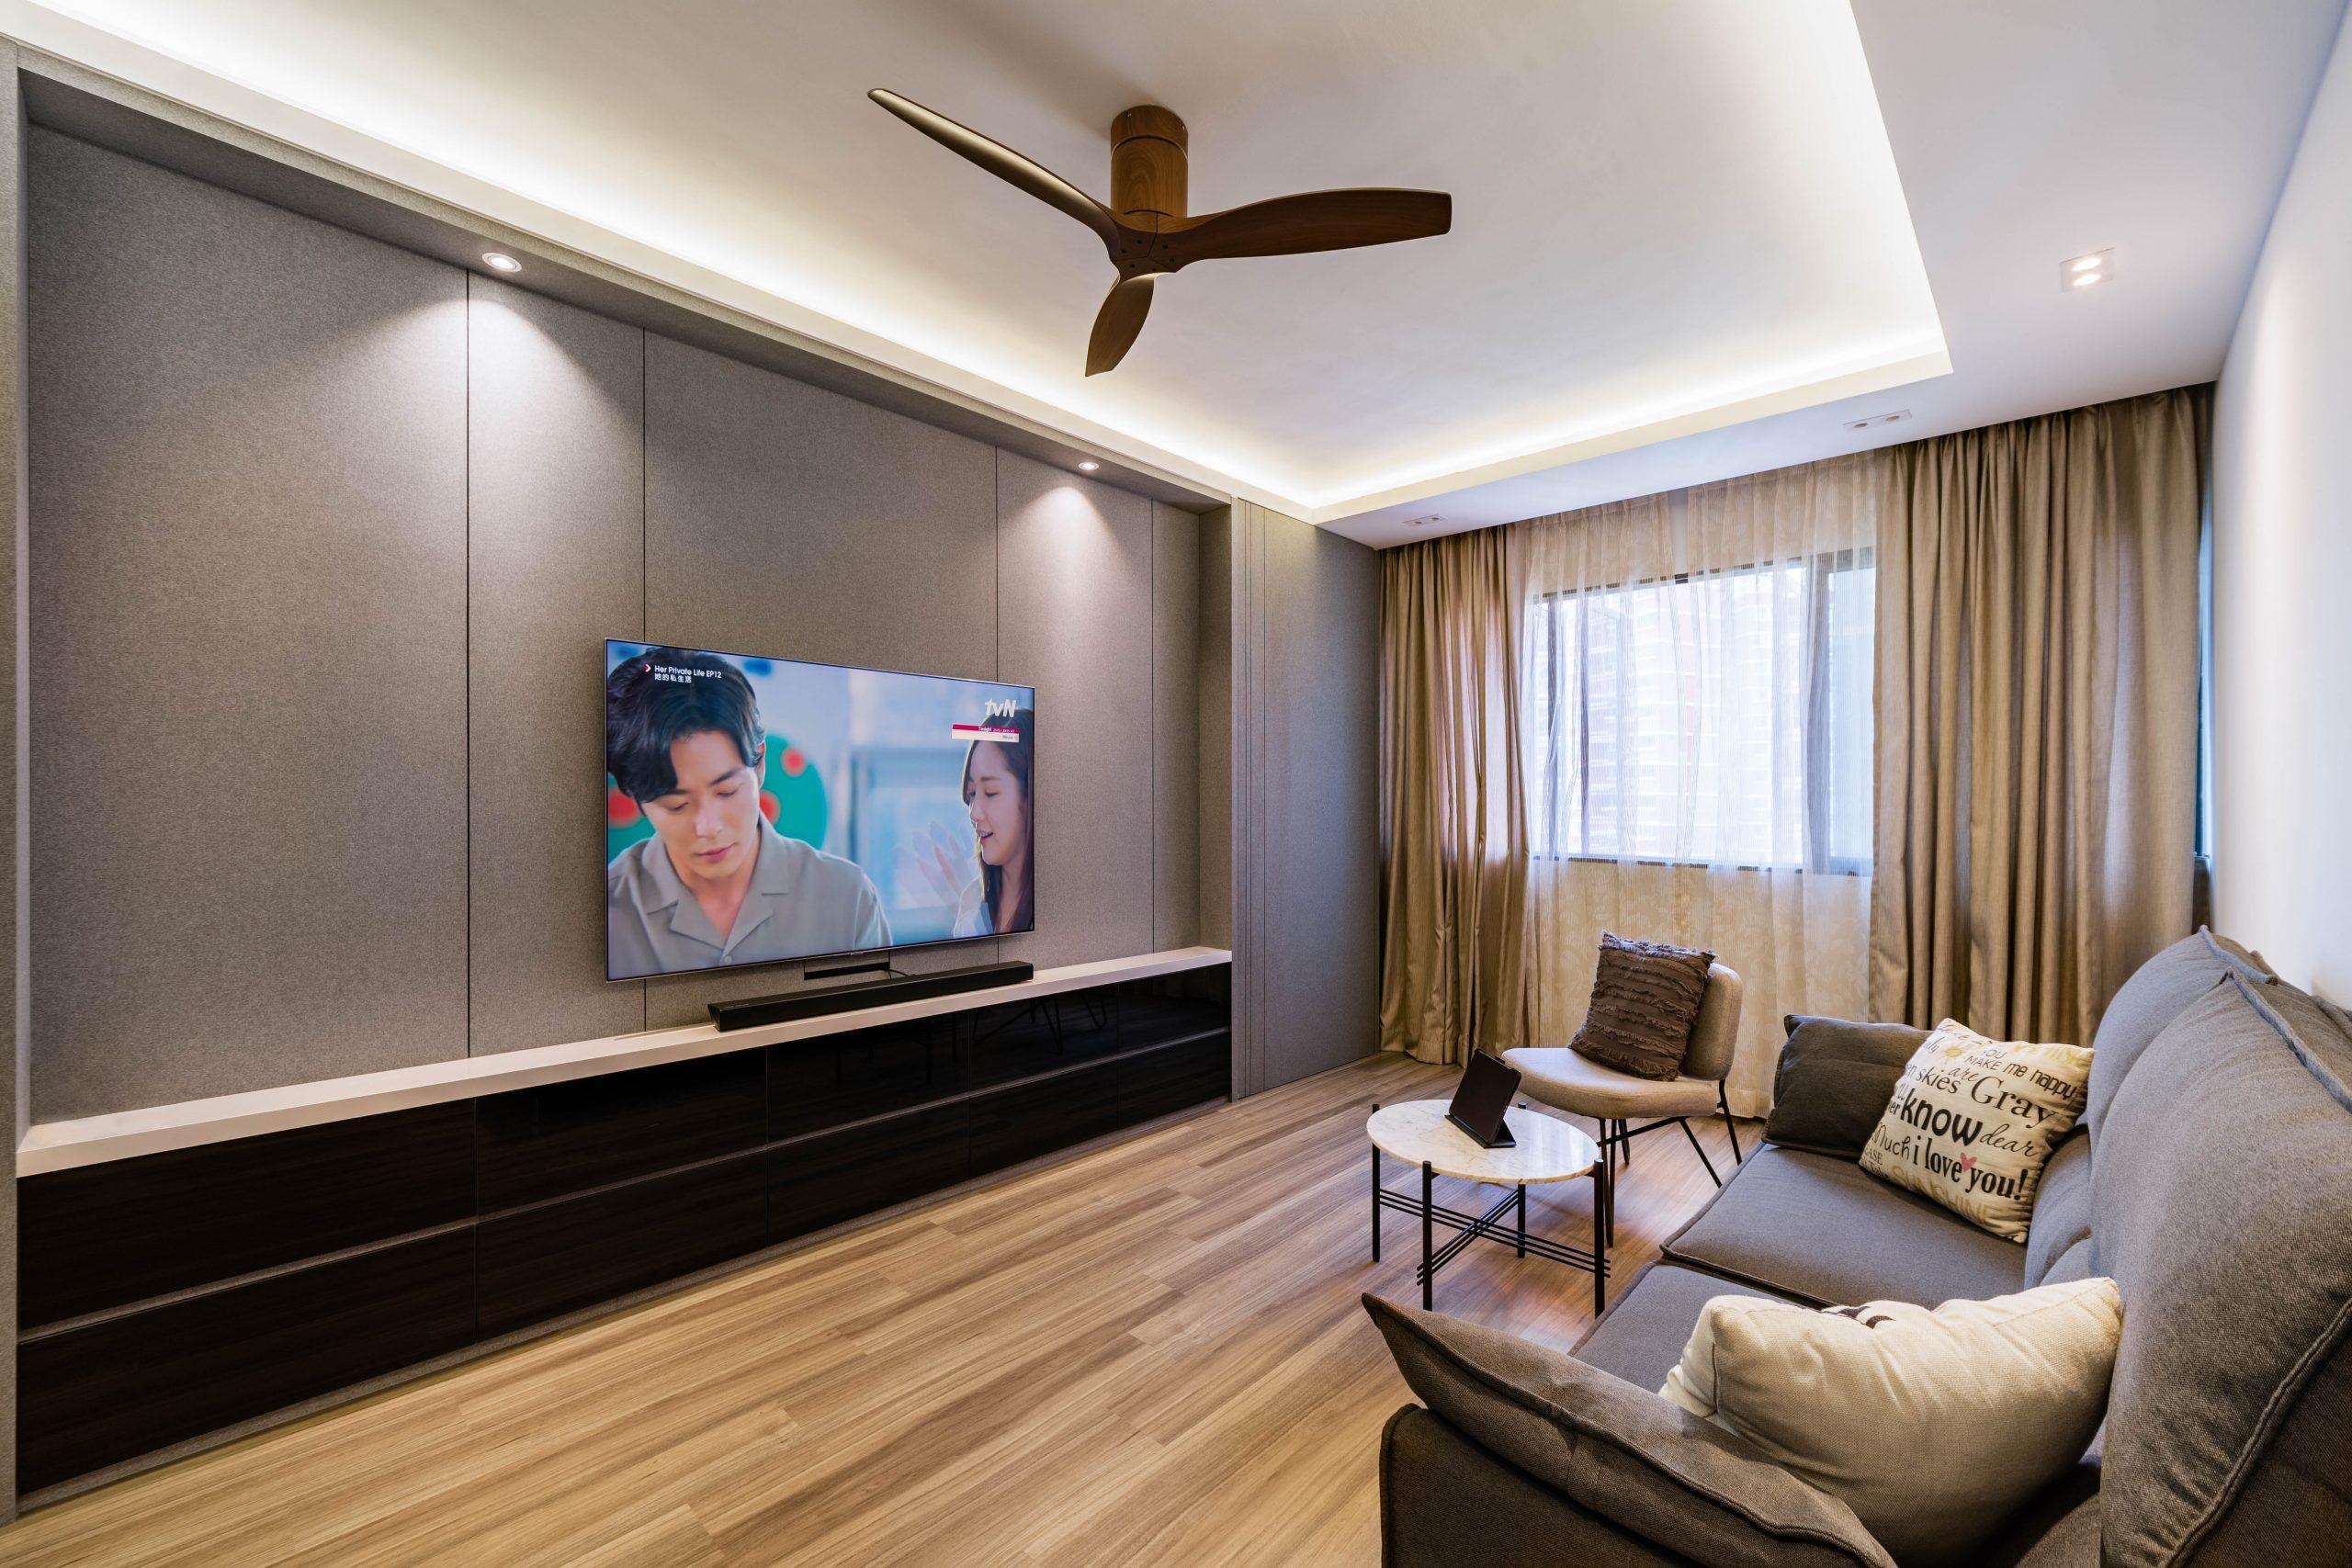 10 Clean-cut TV Feature Wall Design